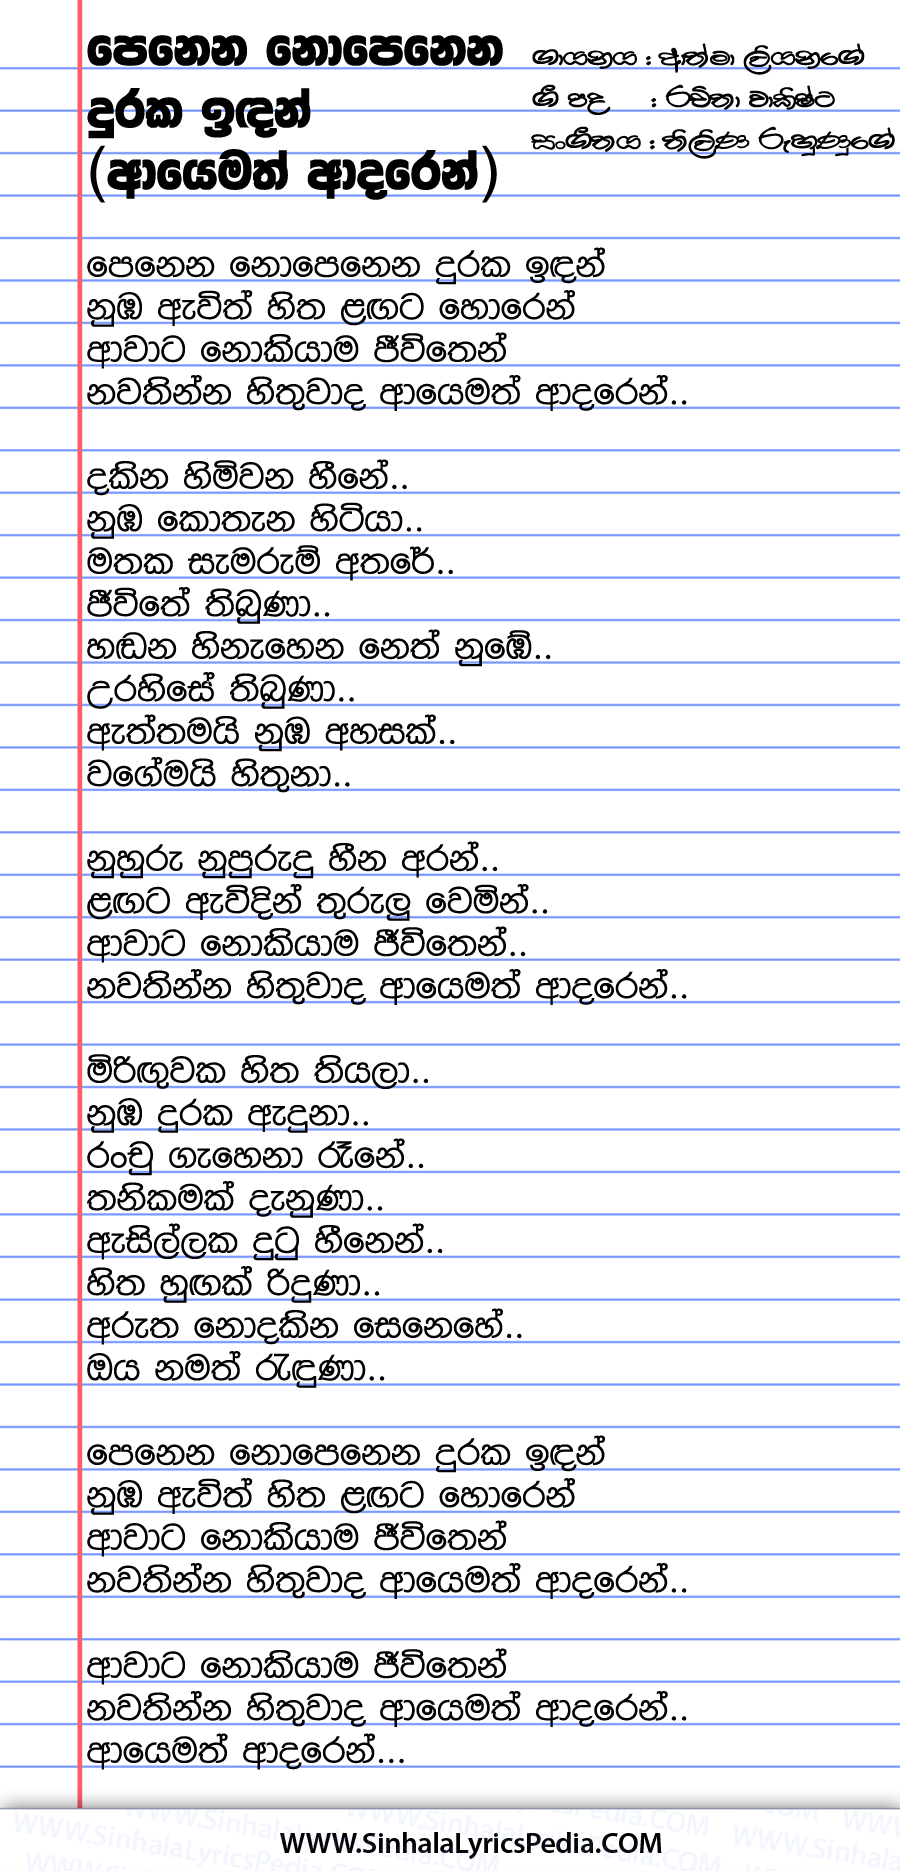 Penena Nopenena Duraka Idan (Ayemath Adaren) Song Lyrics